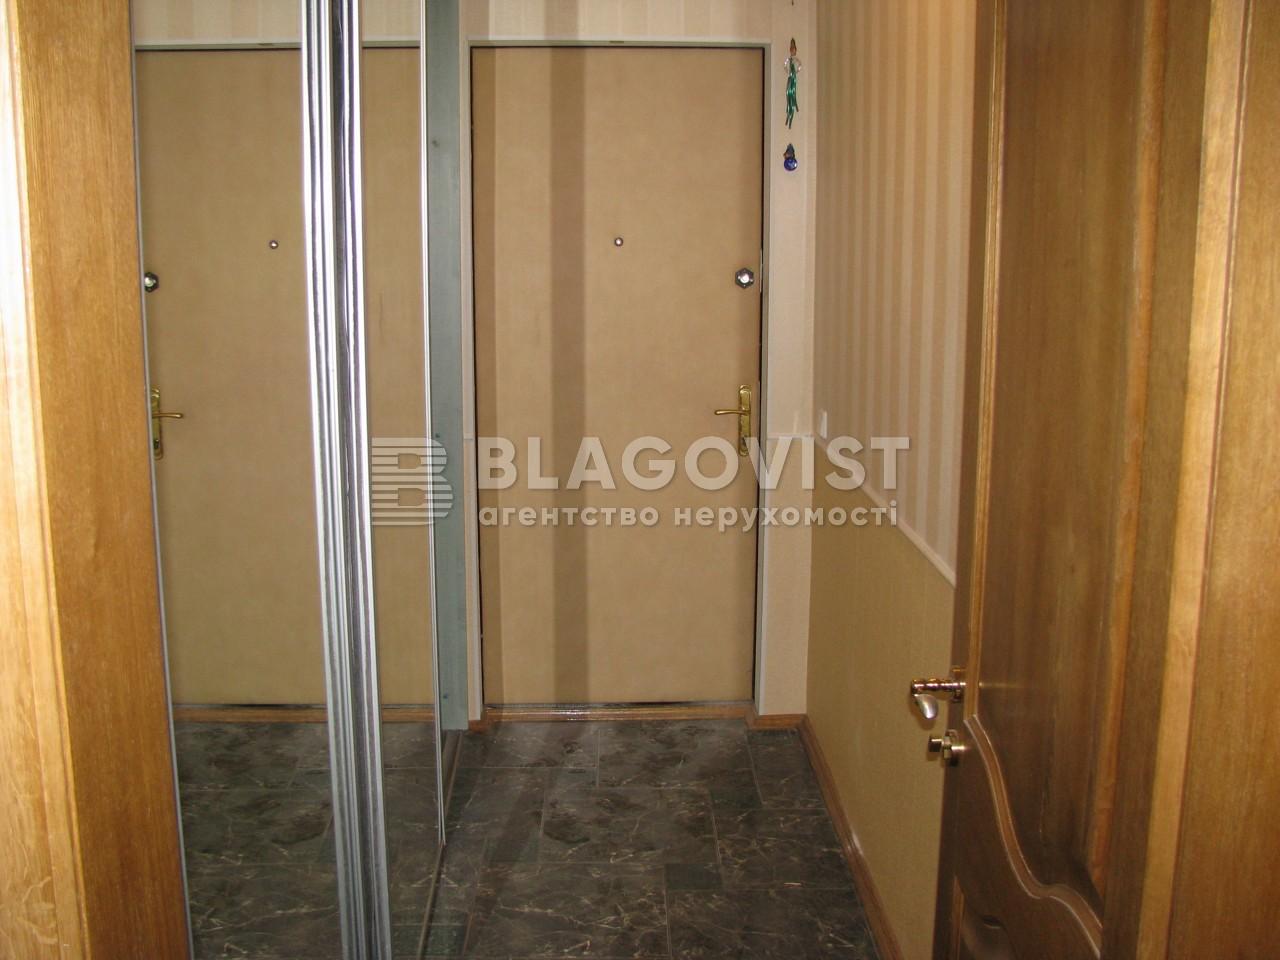 Квартира H-35926, Богатырская, 6/1, Киев - Фото 14